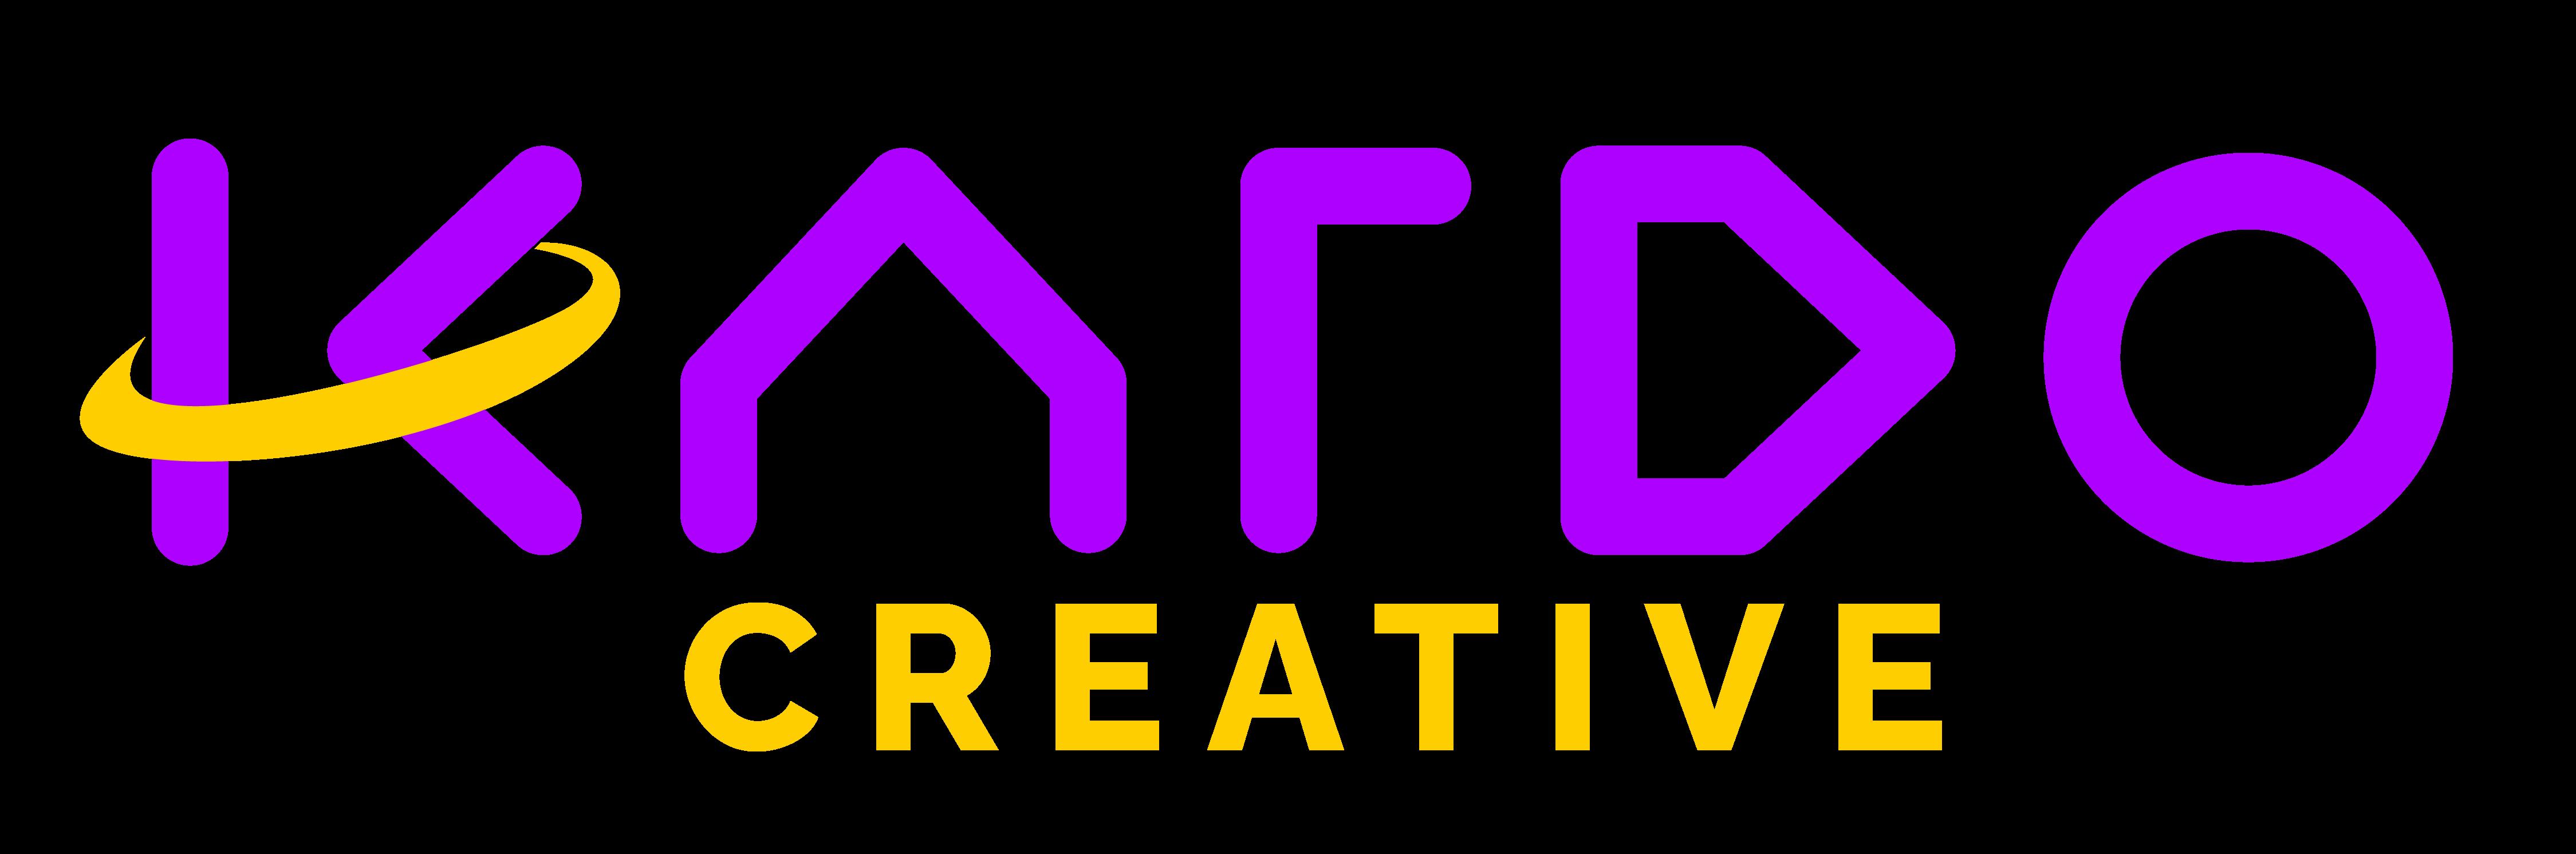 Kardo Creative